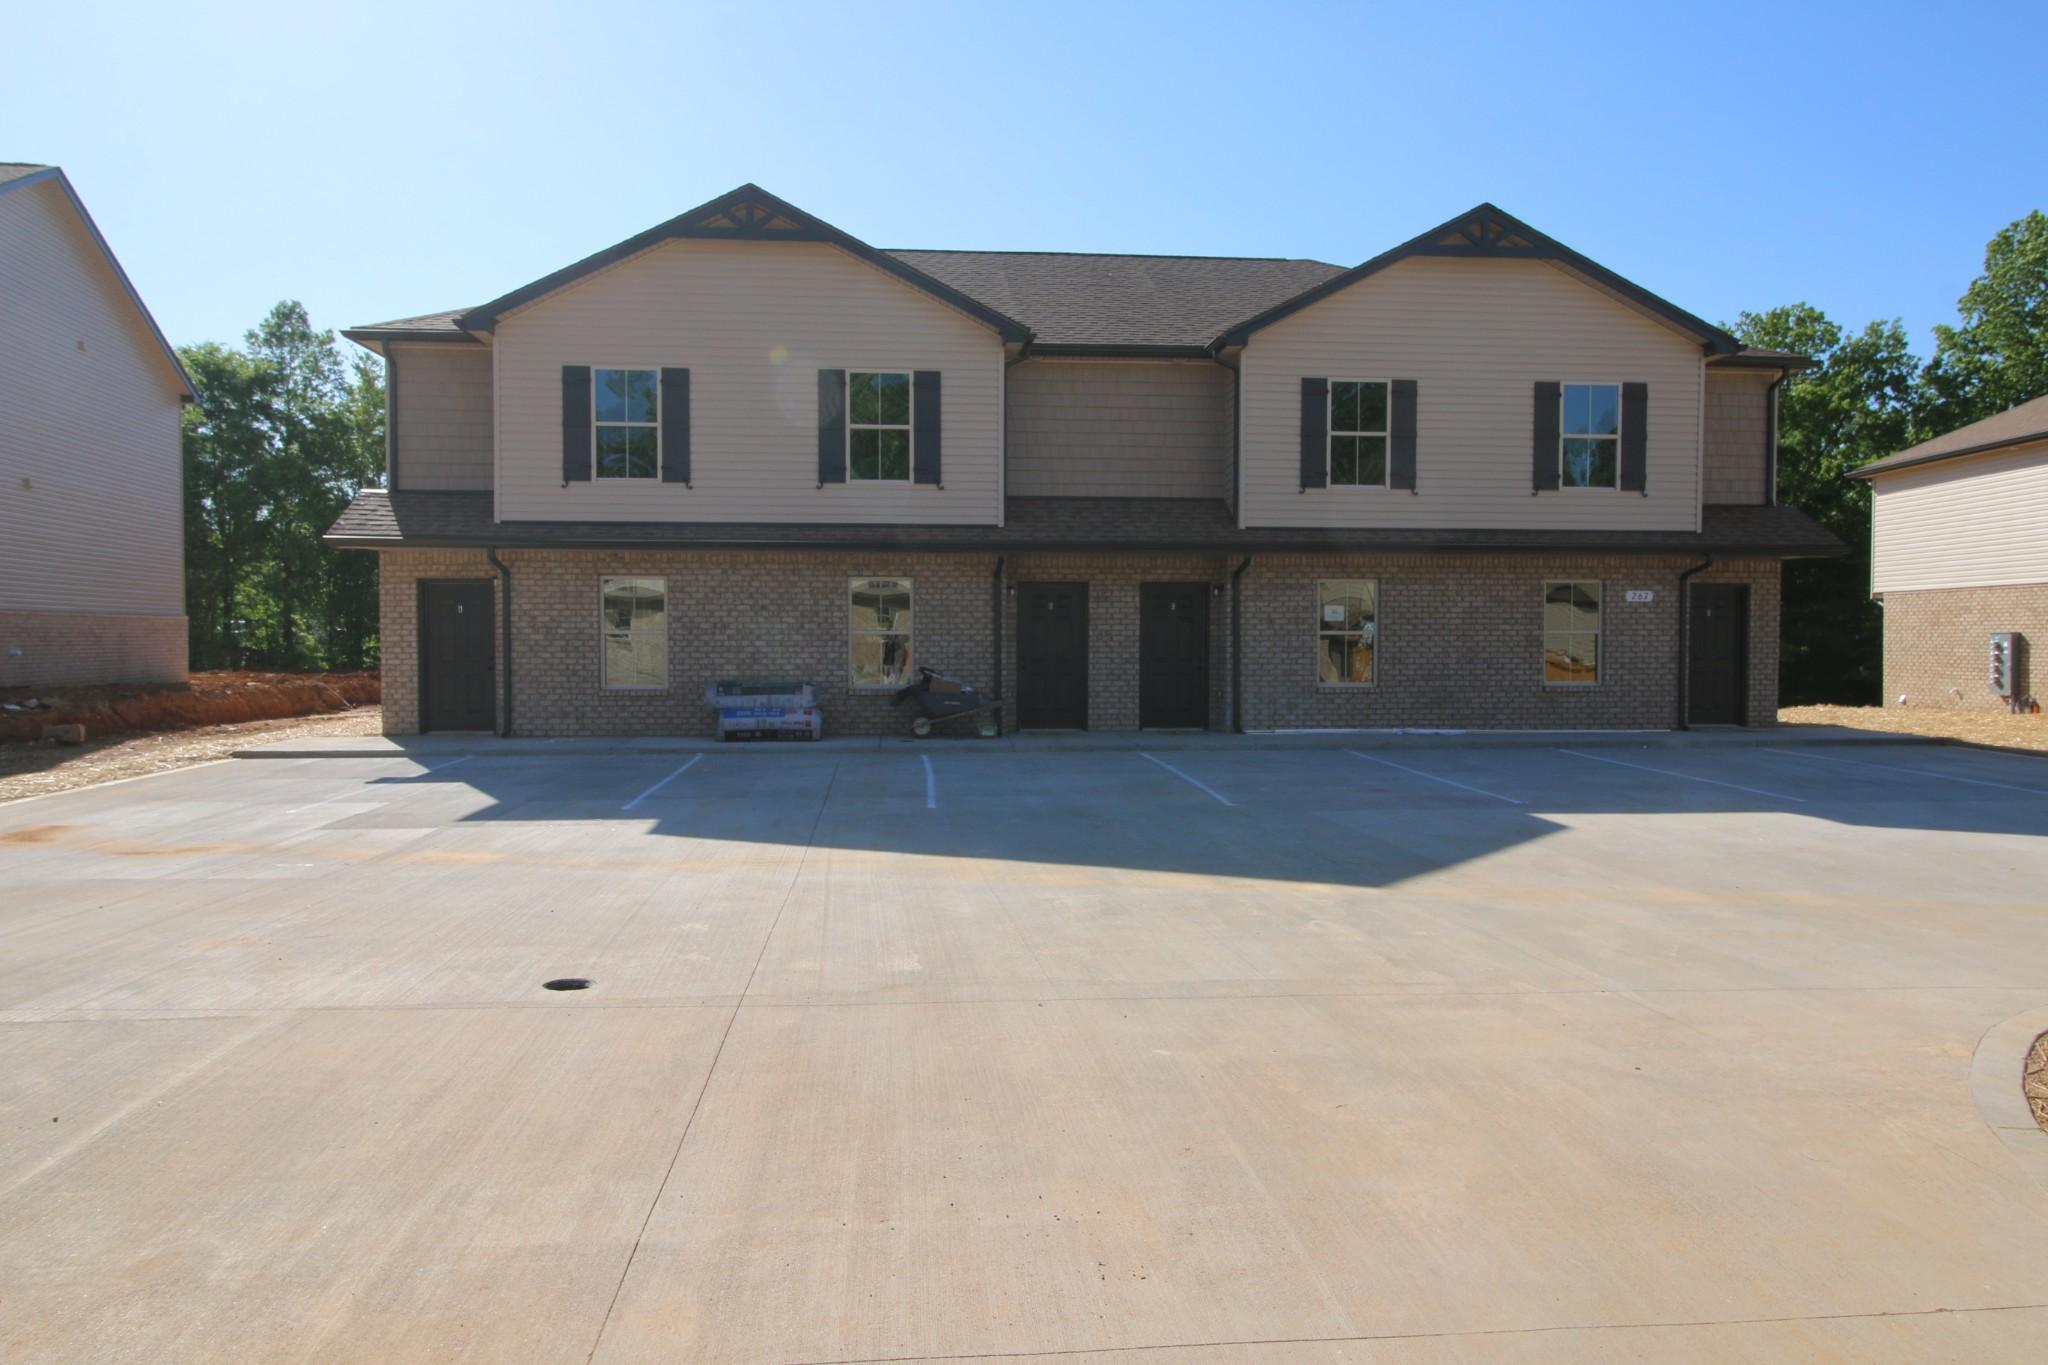 36 Flint Ridge Property Photo - Clarksville, TN real estate listing